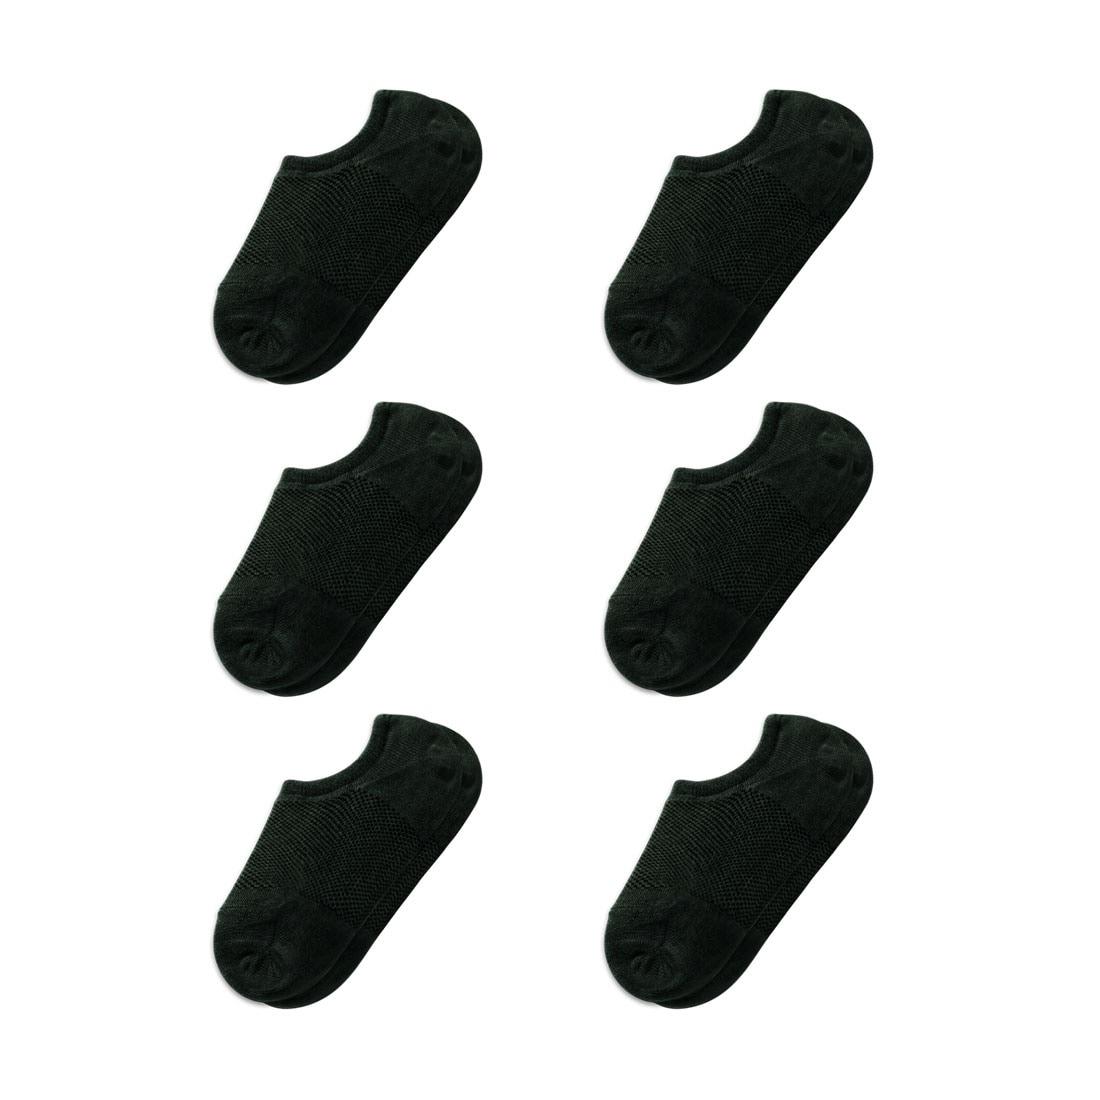 Women Low Cut Silicone Heel Grip